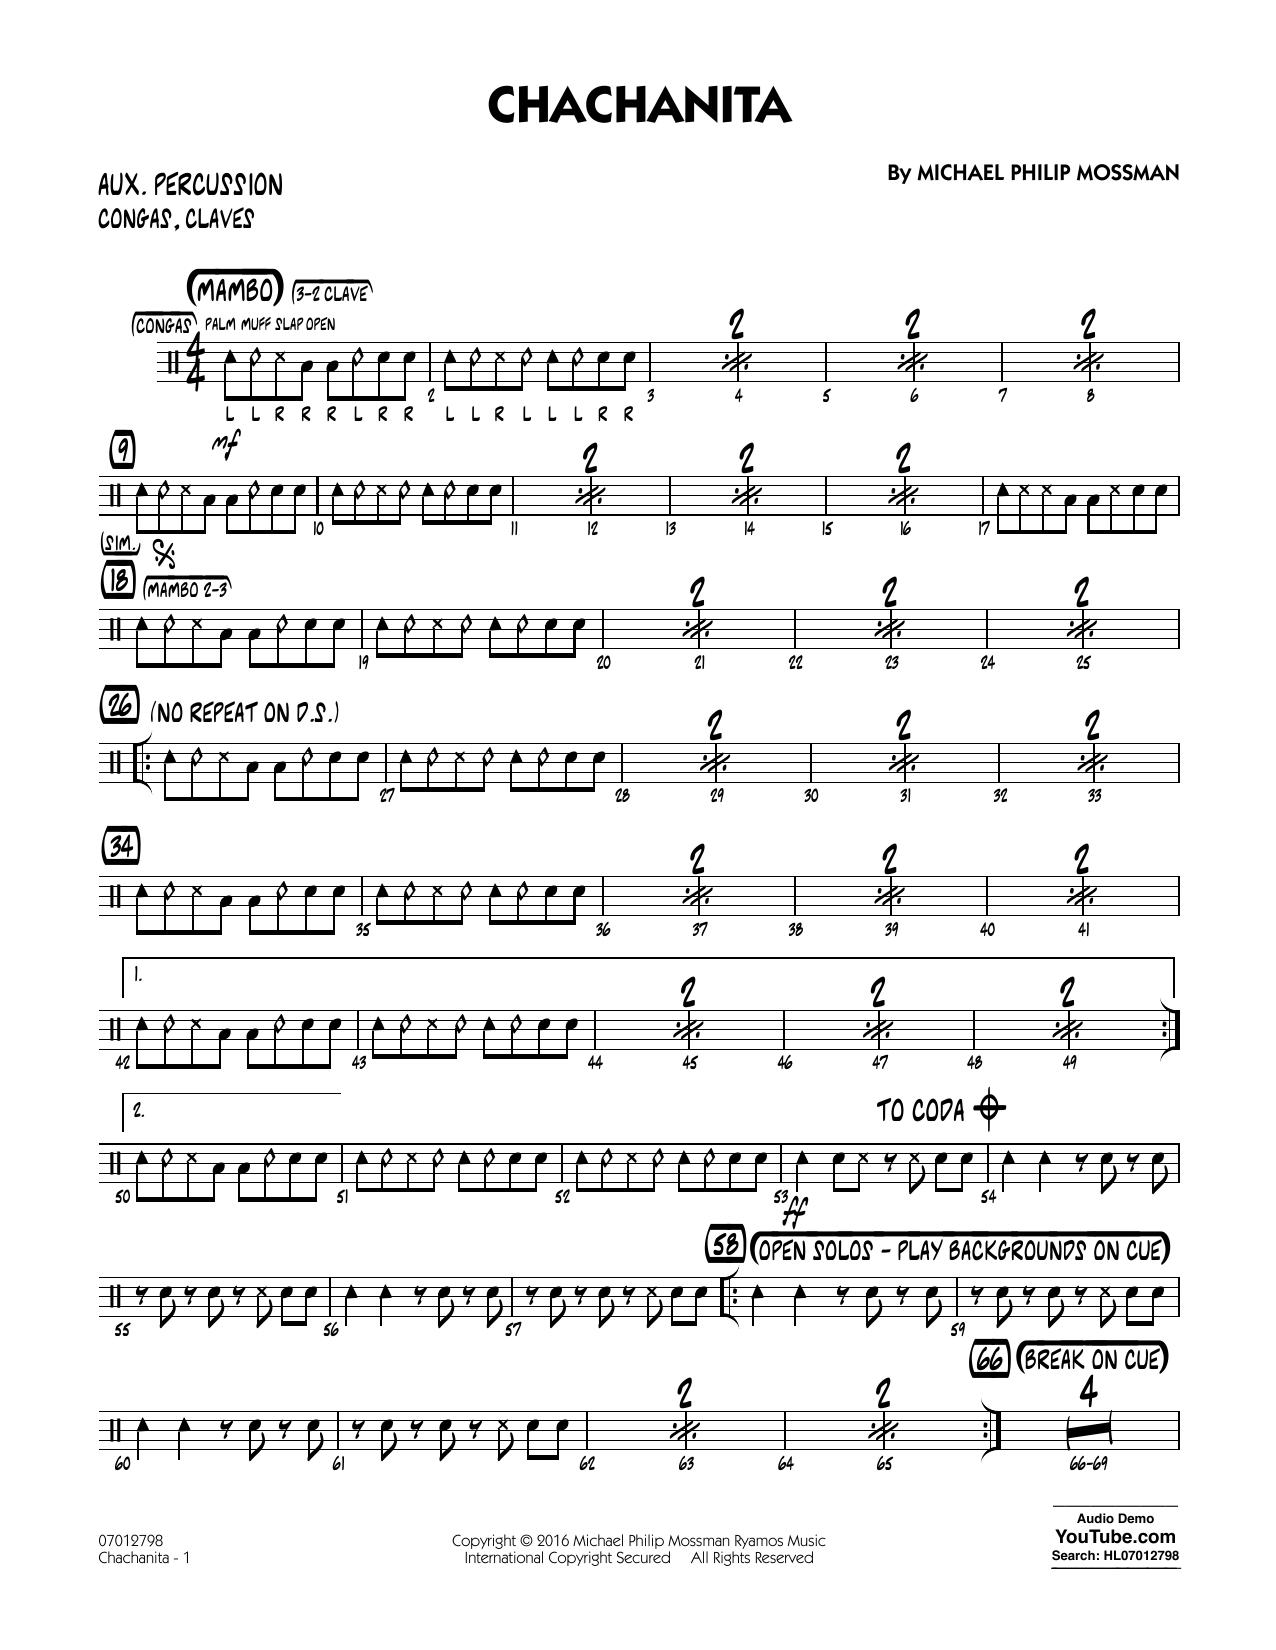 Chachanita - Aux Percussion